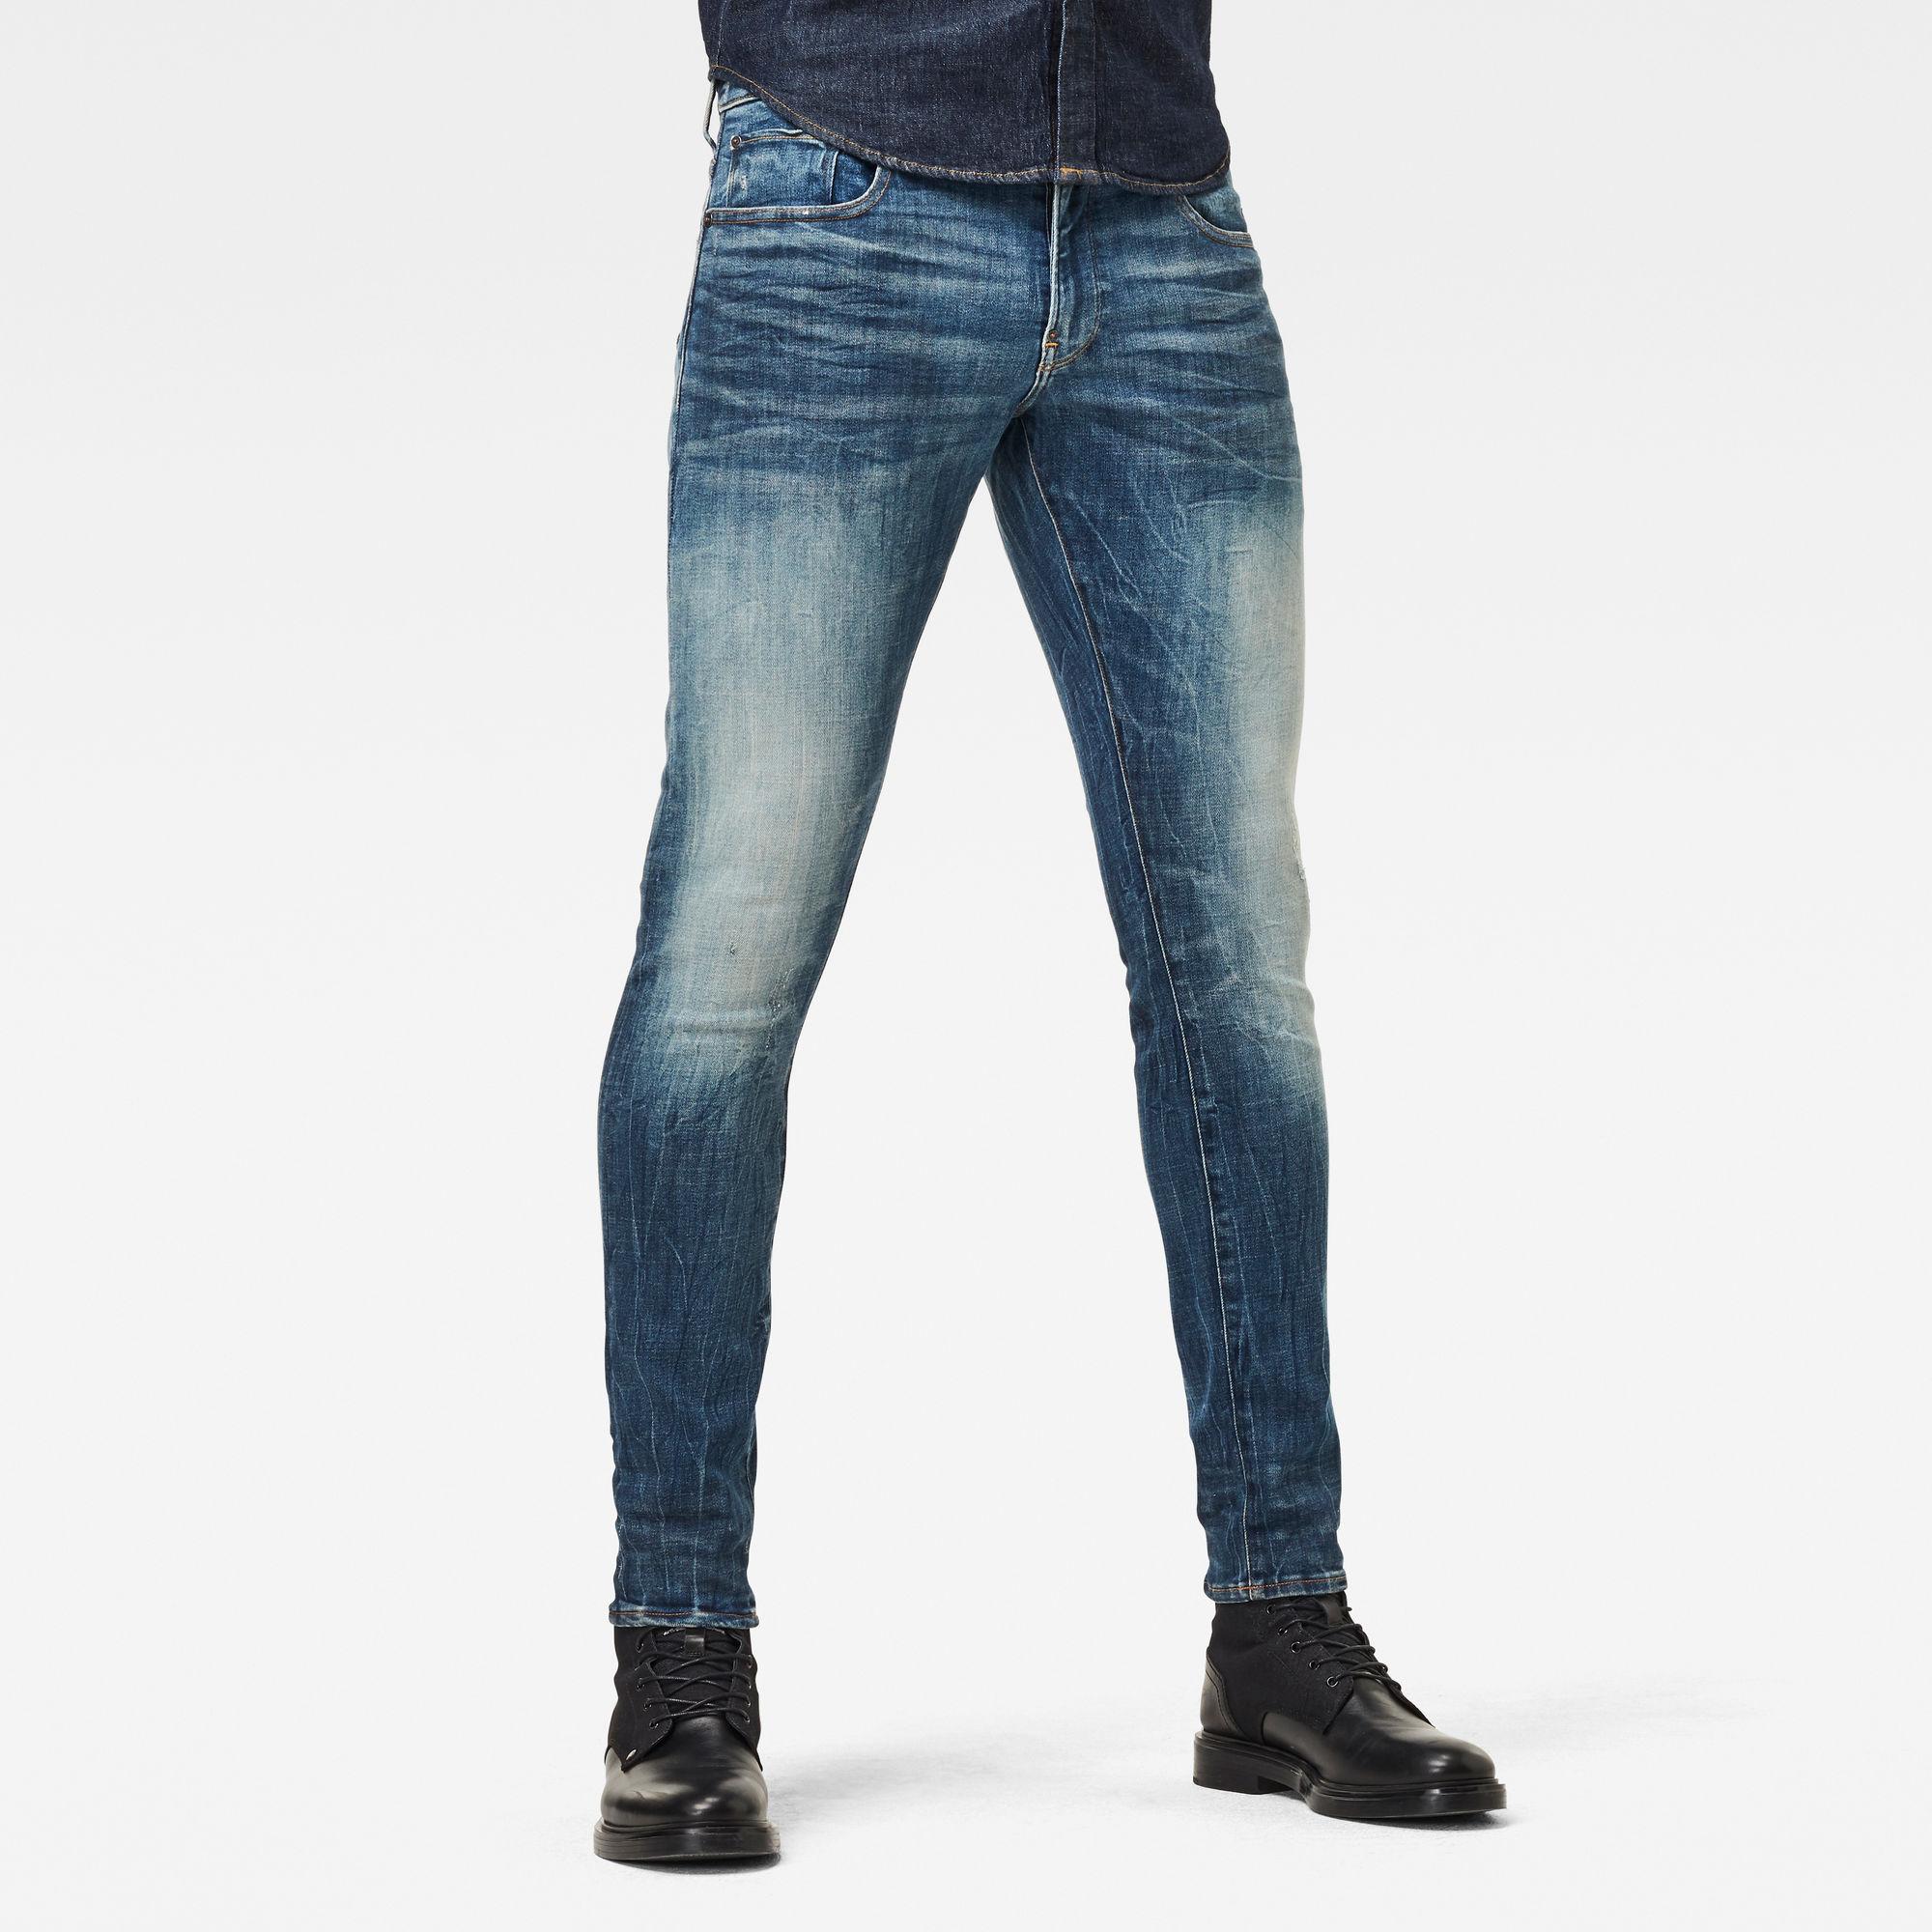 G-Star RAW Heren Revend Skinny Originals Jeans Blauw